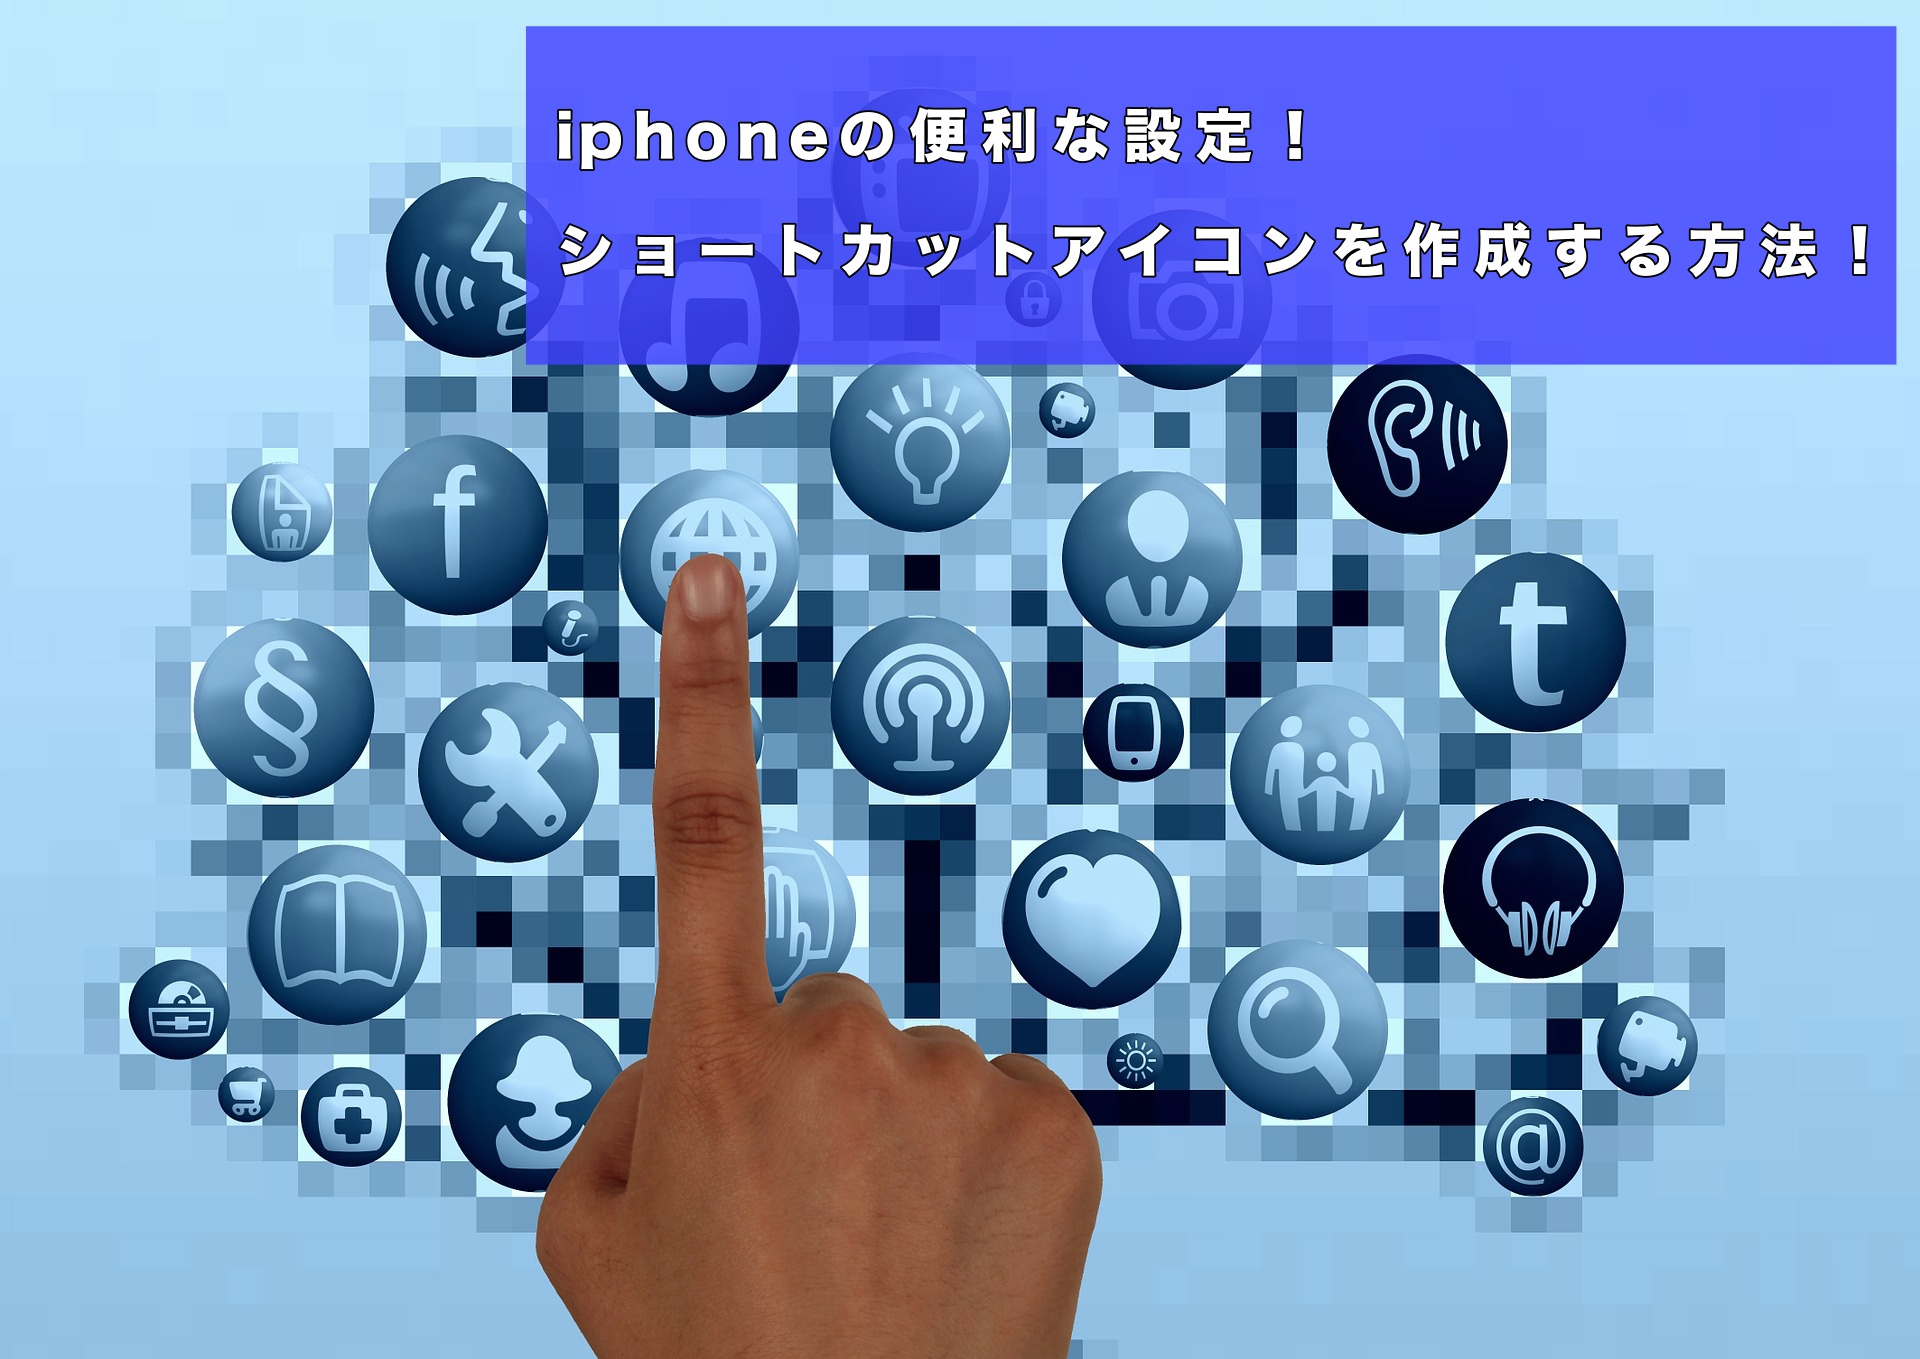 iphoneの便利な設定!ショートカットアイコンを作成する方法!